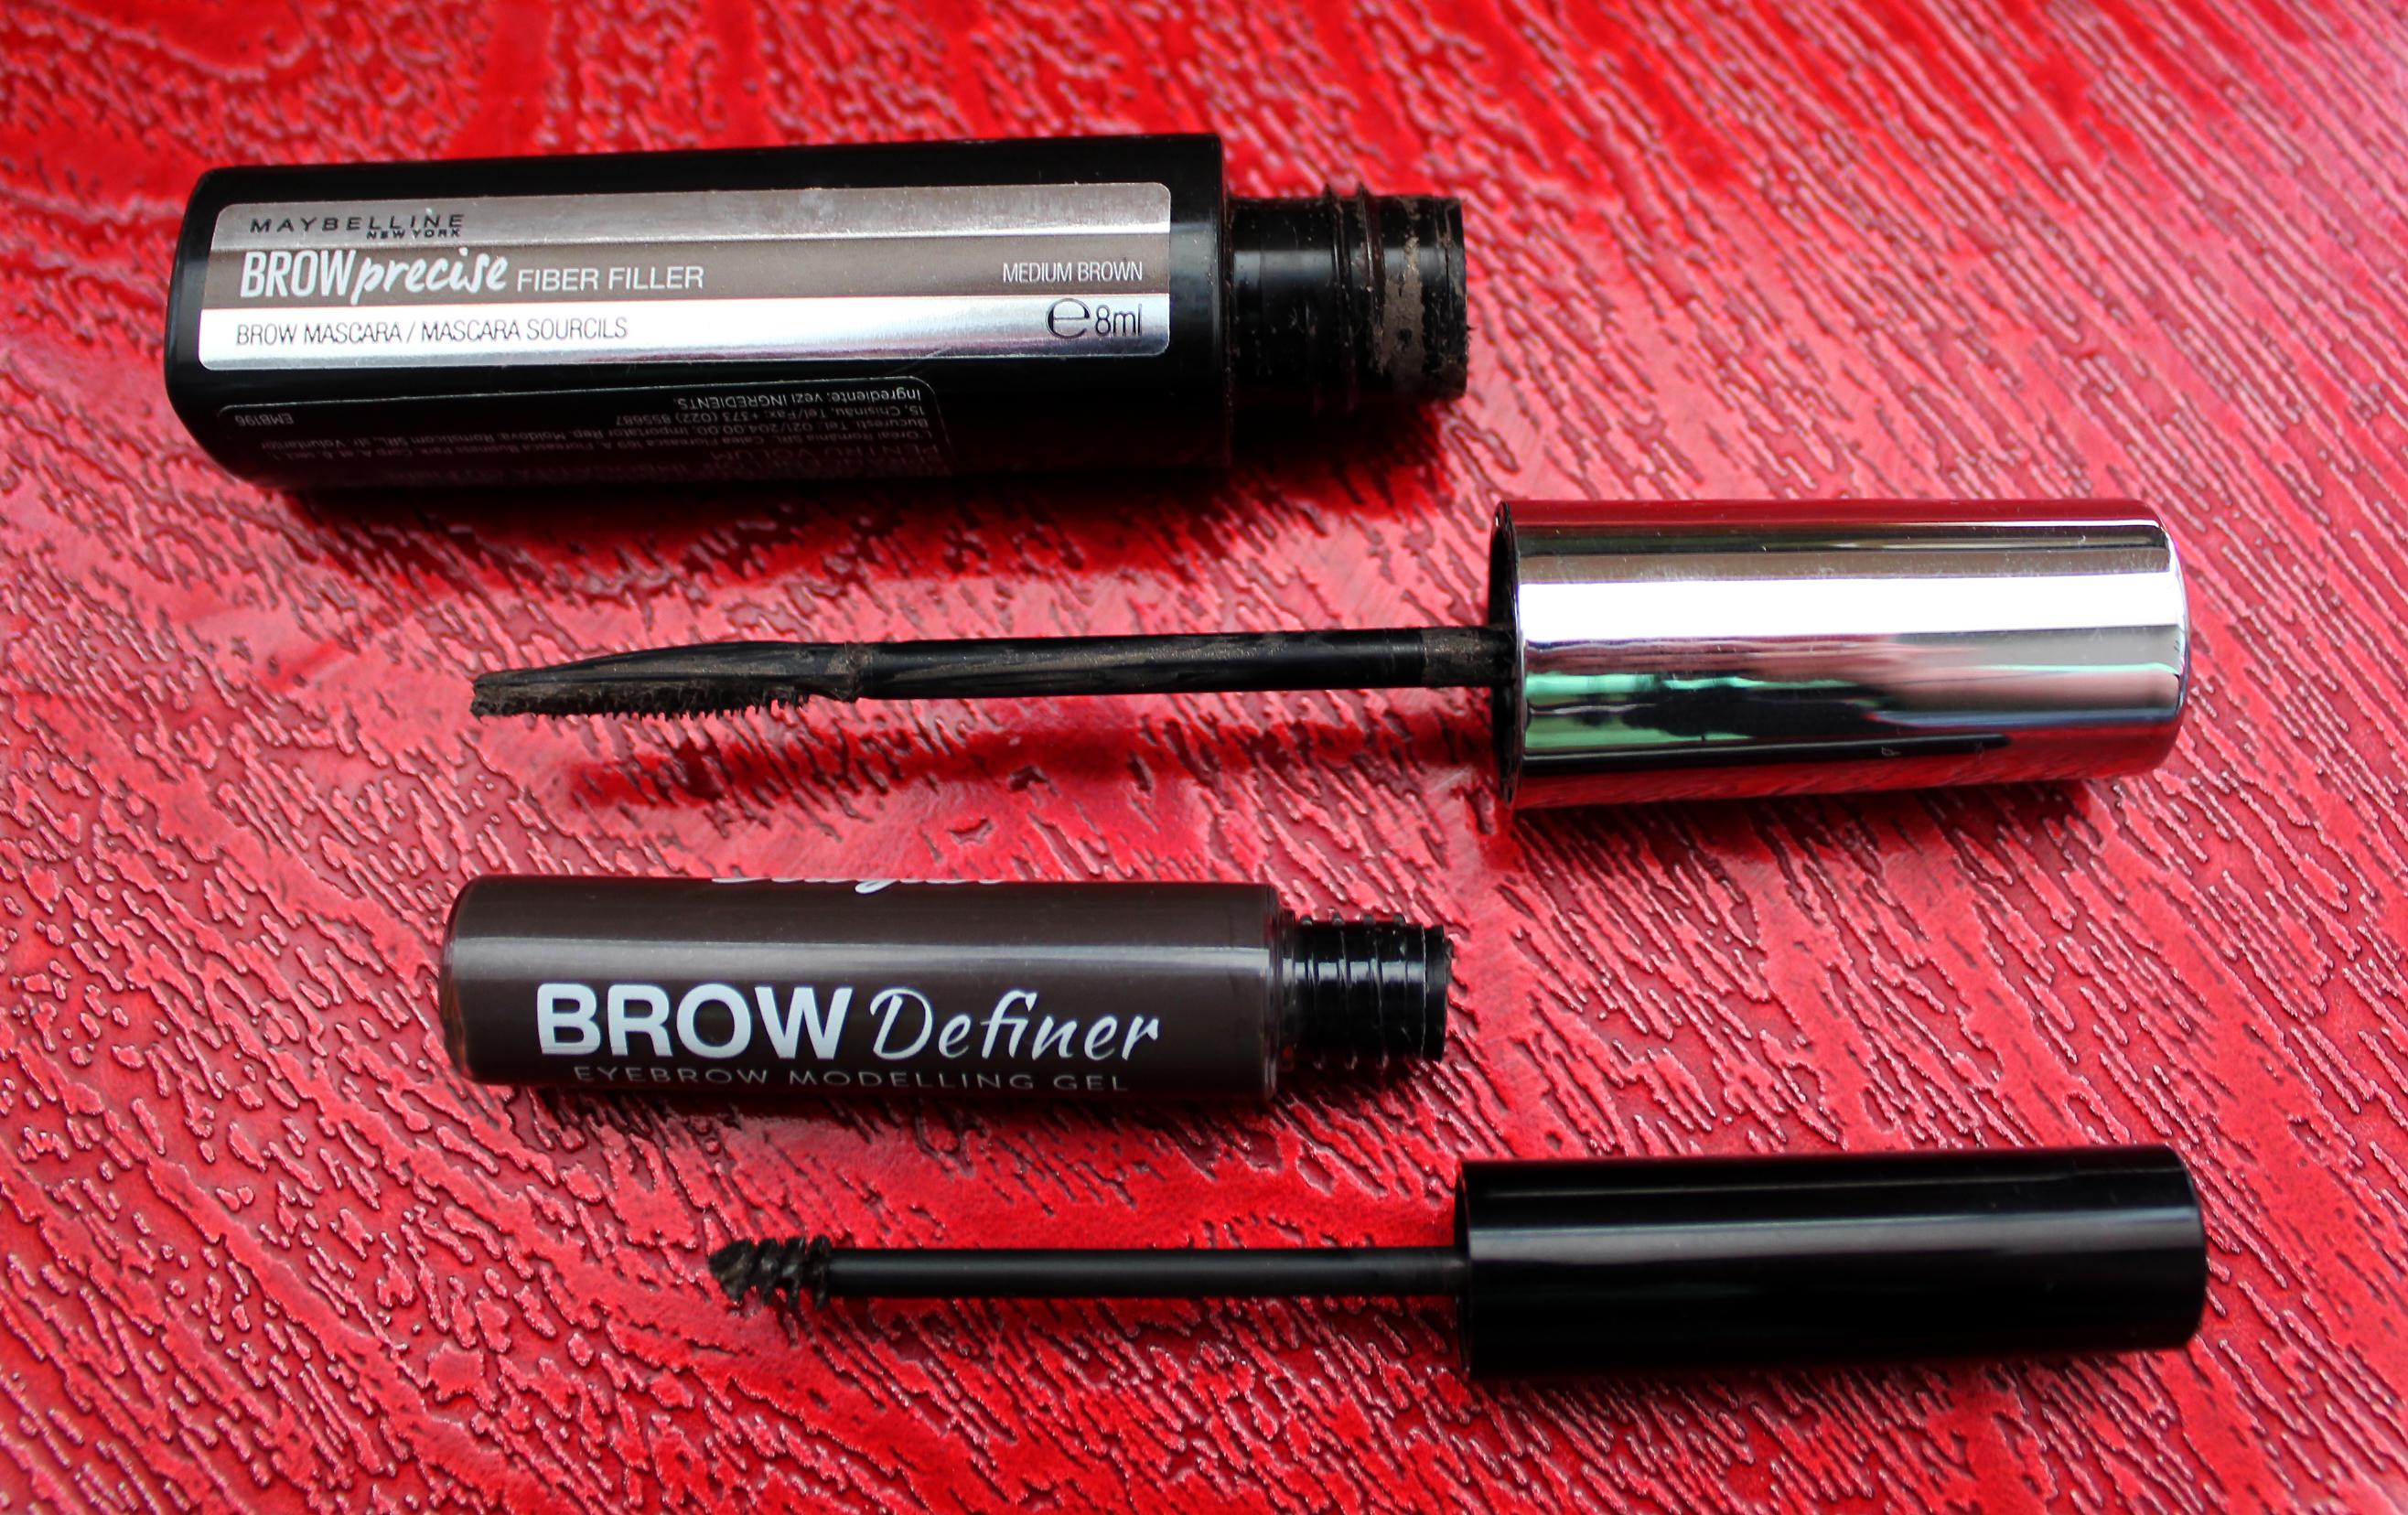 brow precise filler maybelline brow definer douglas